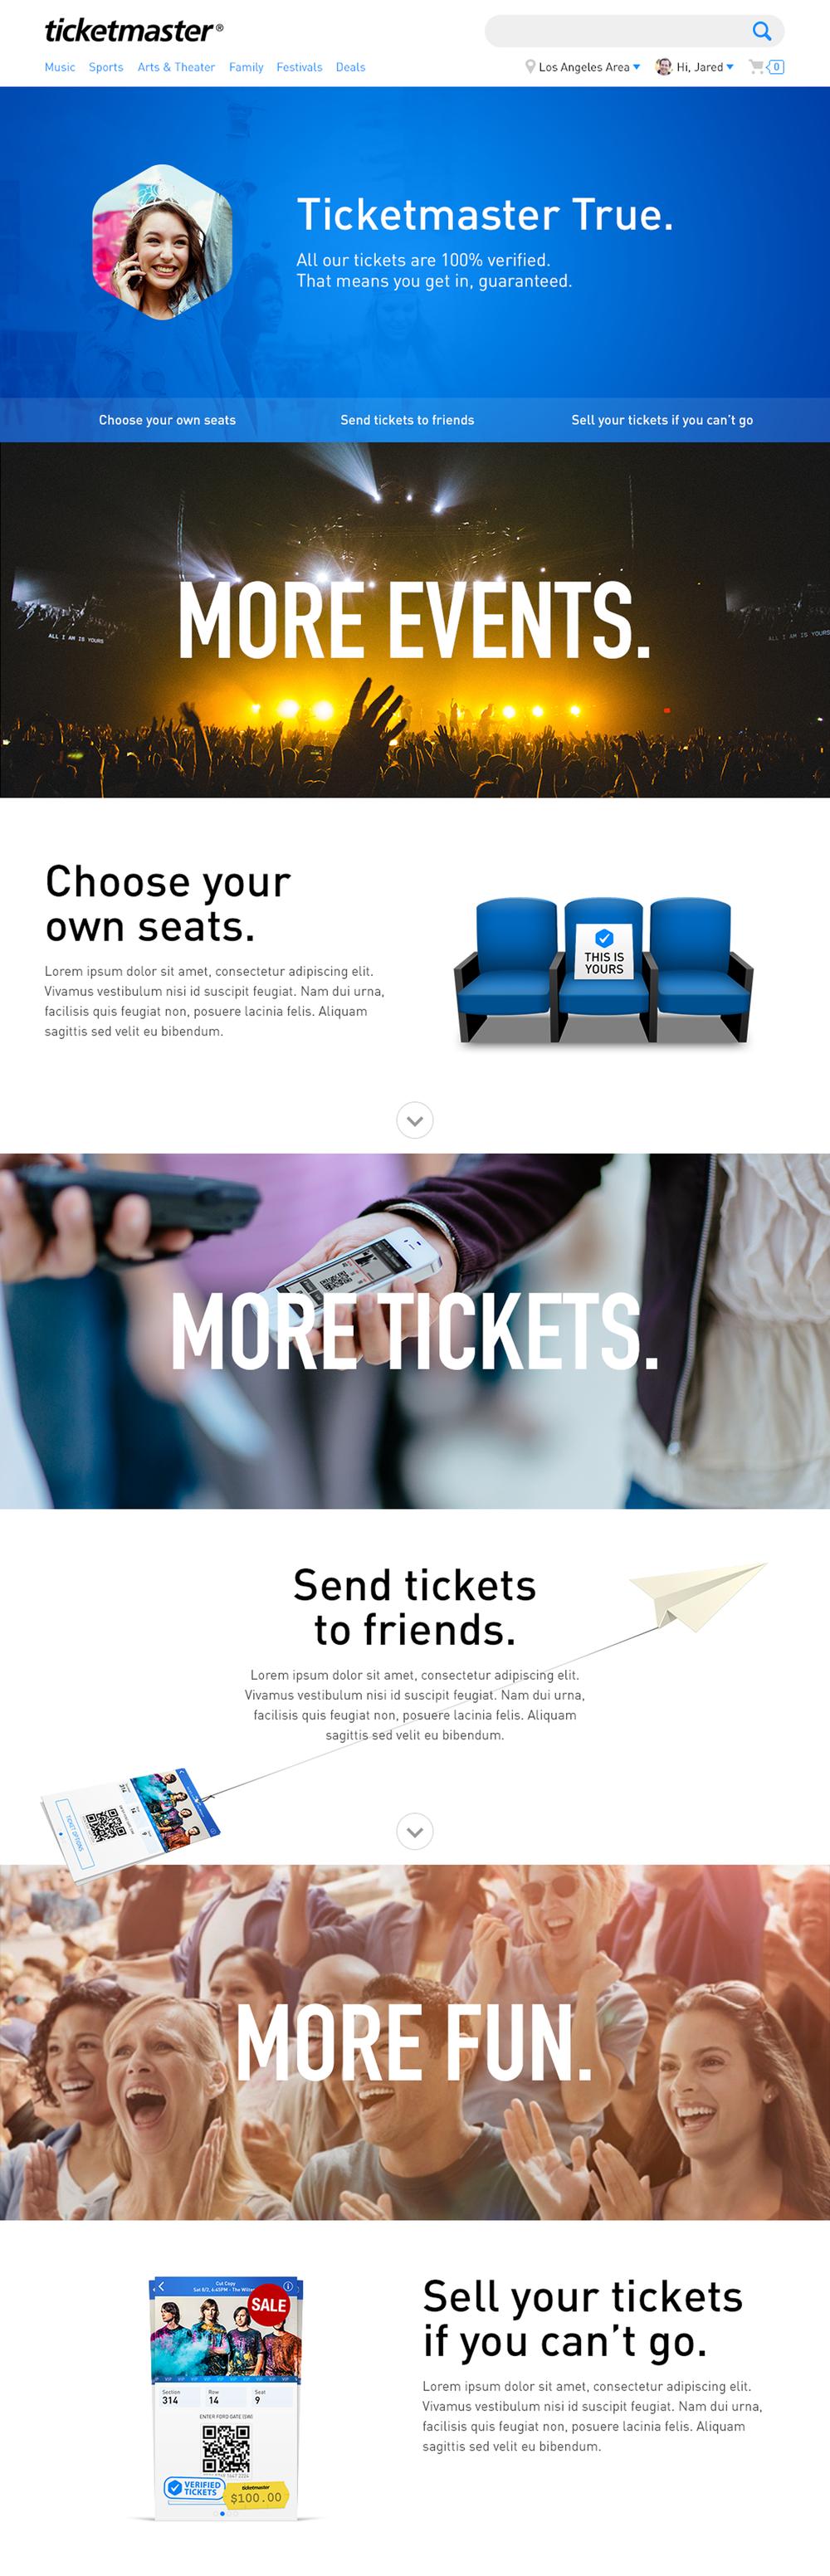 Ticketmaster True Promo